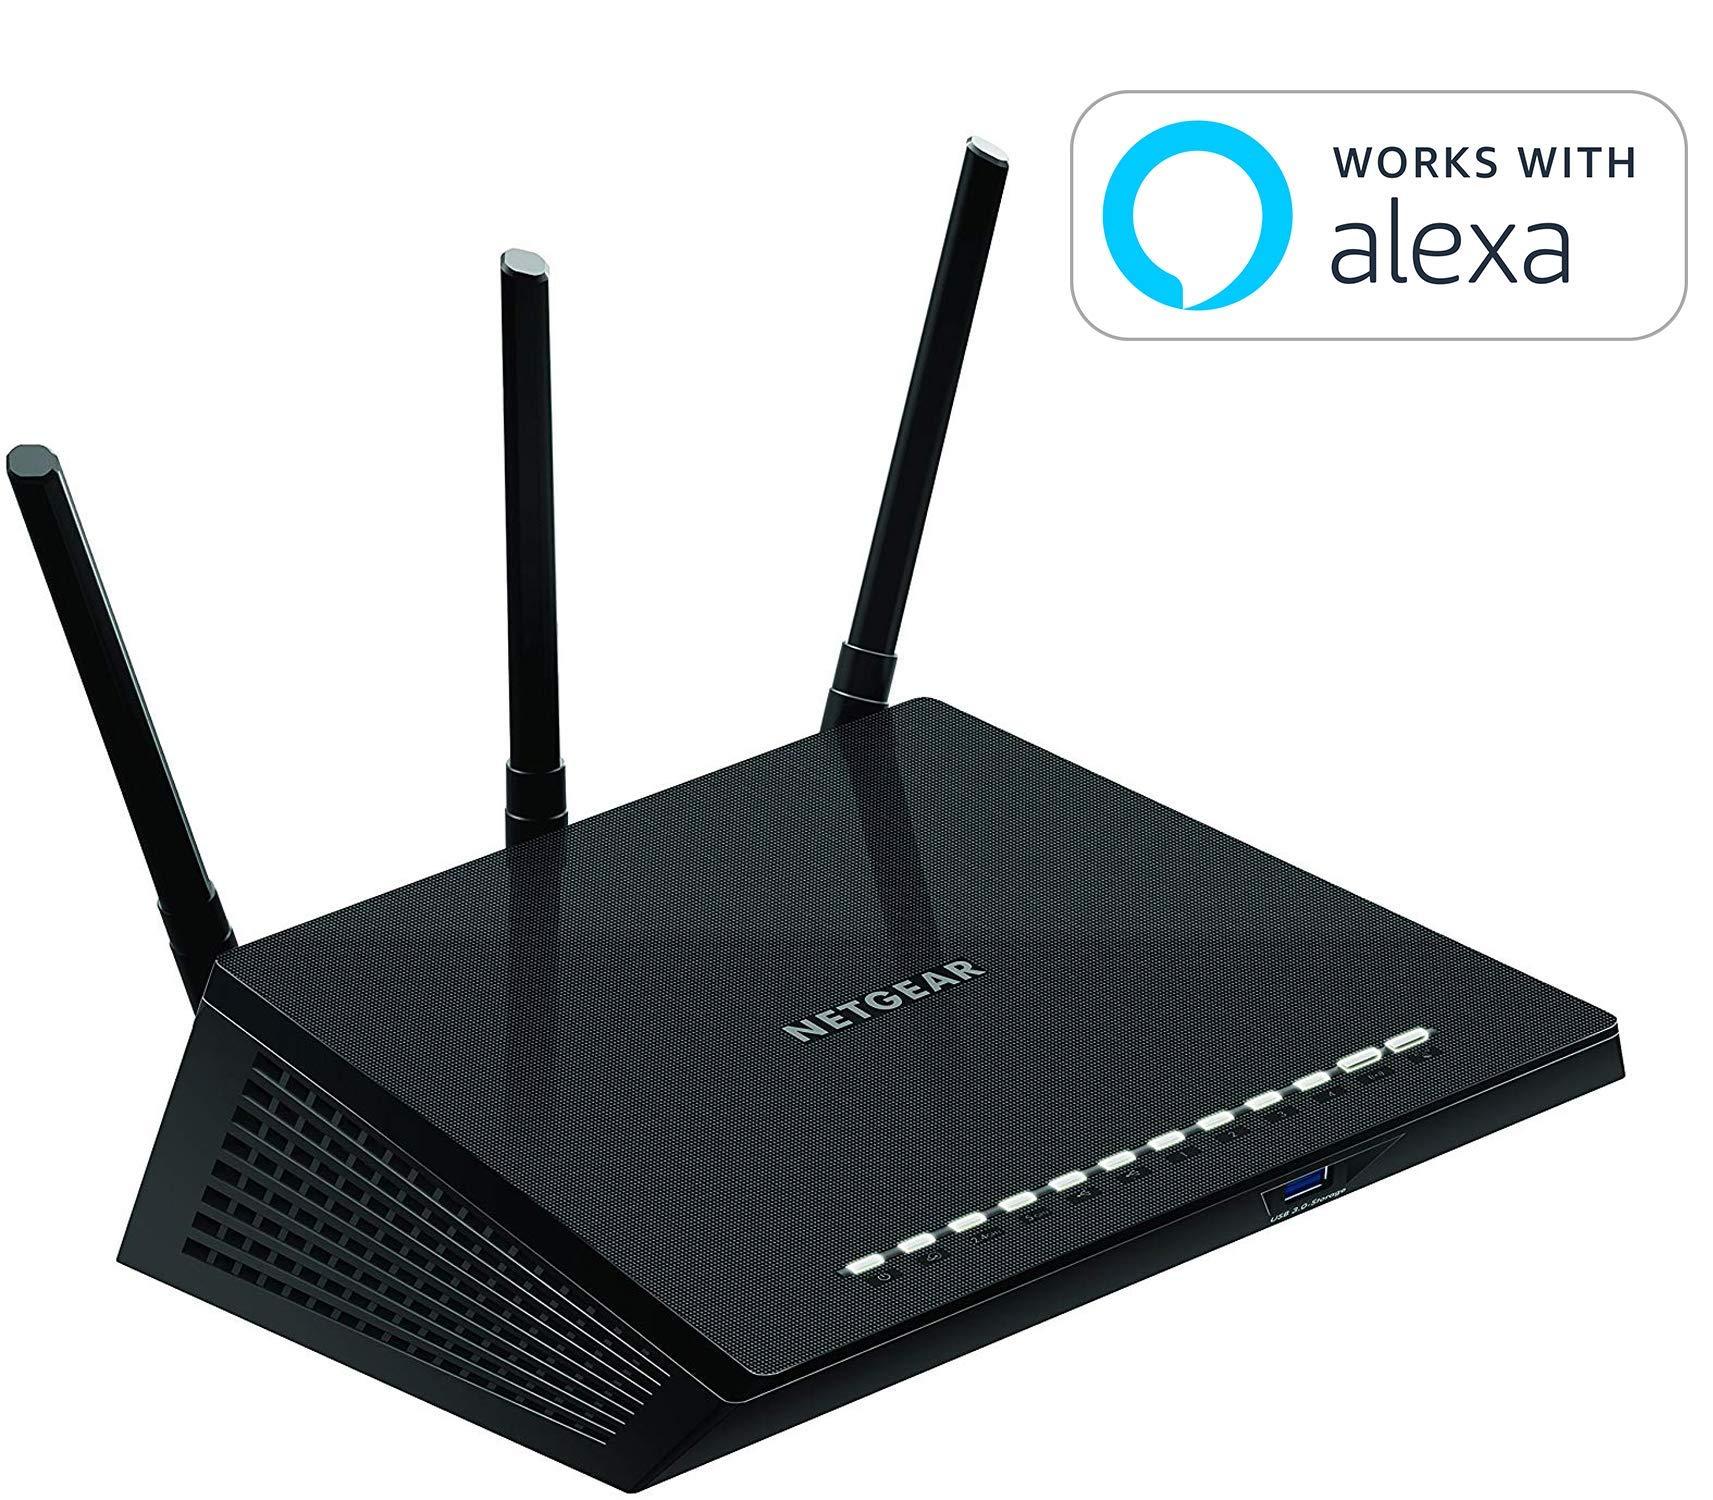 NETGEAR R6700 Nighthawk AC1750 Dual Band Smart WiFi Router, Gigabit Ethernet (R6700) by NETGEAR (Image #1)